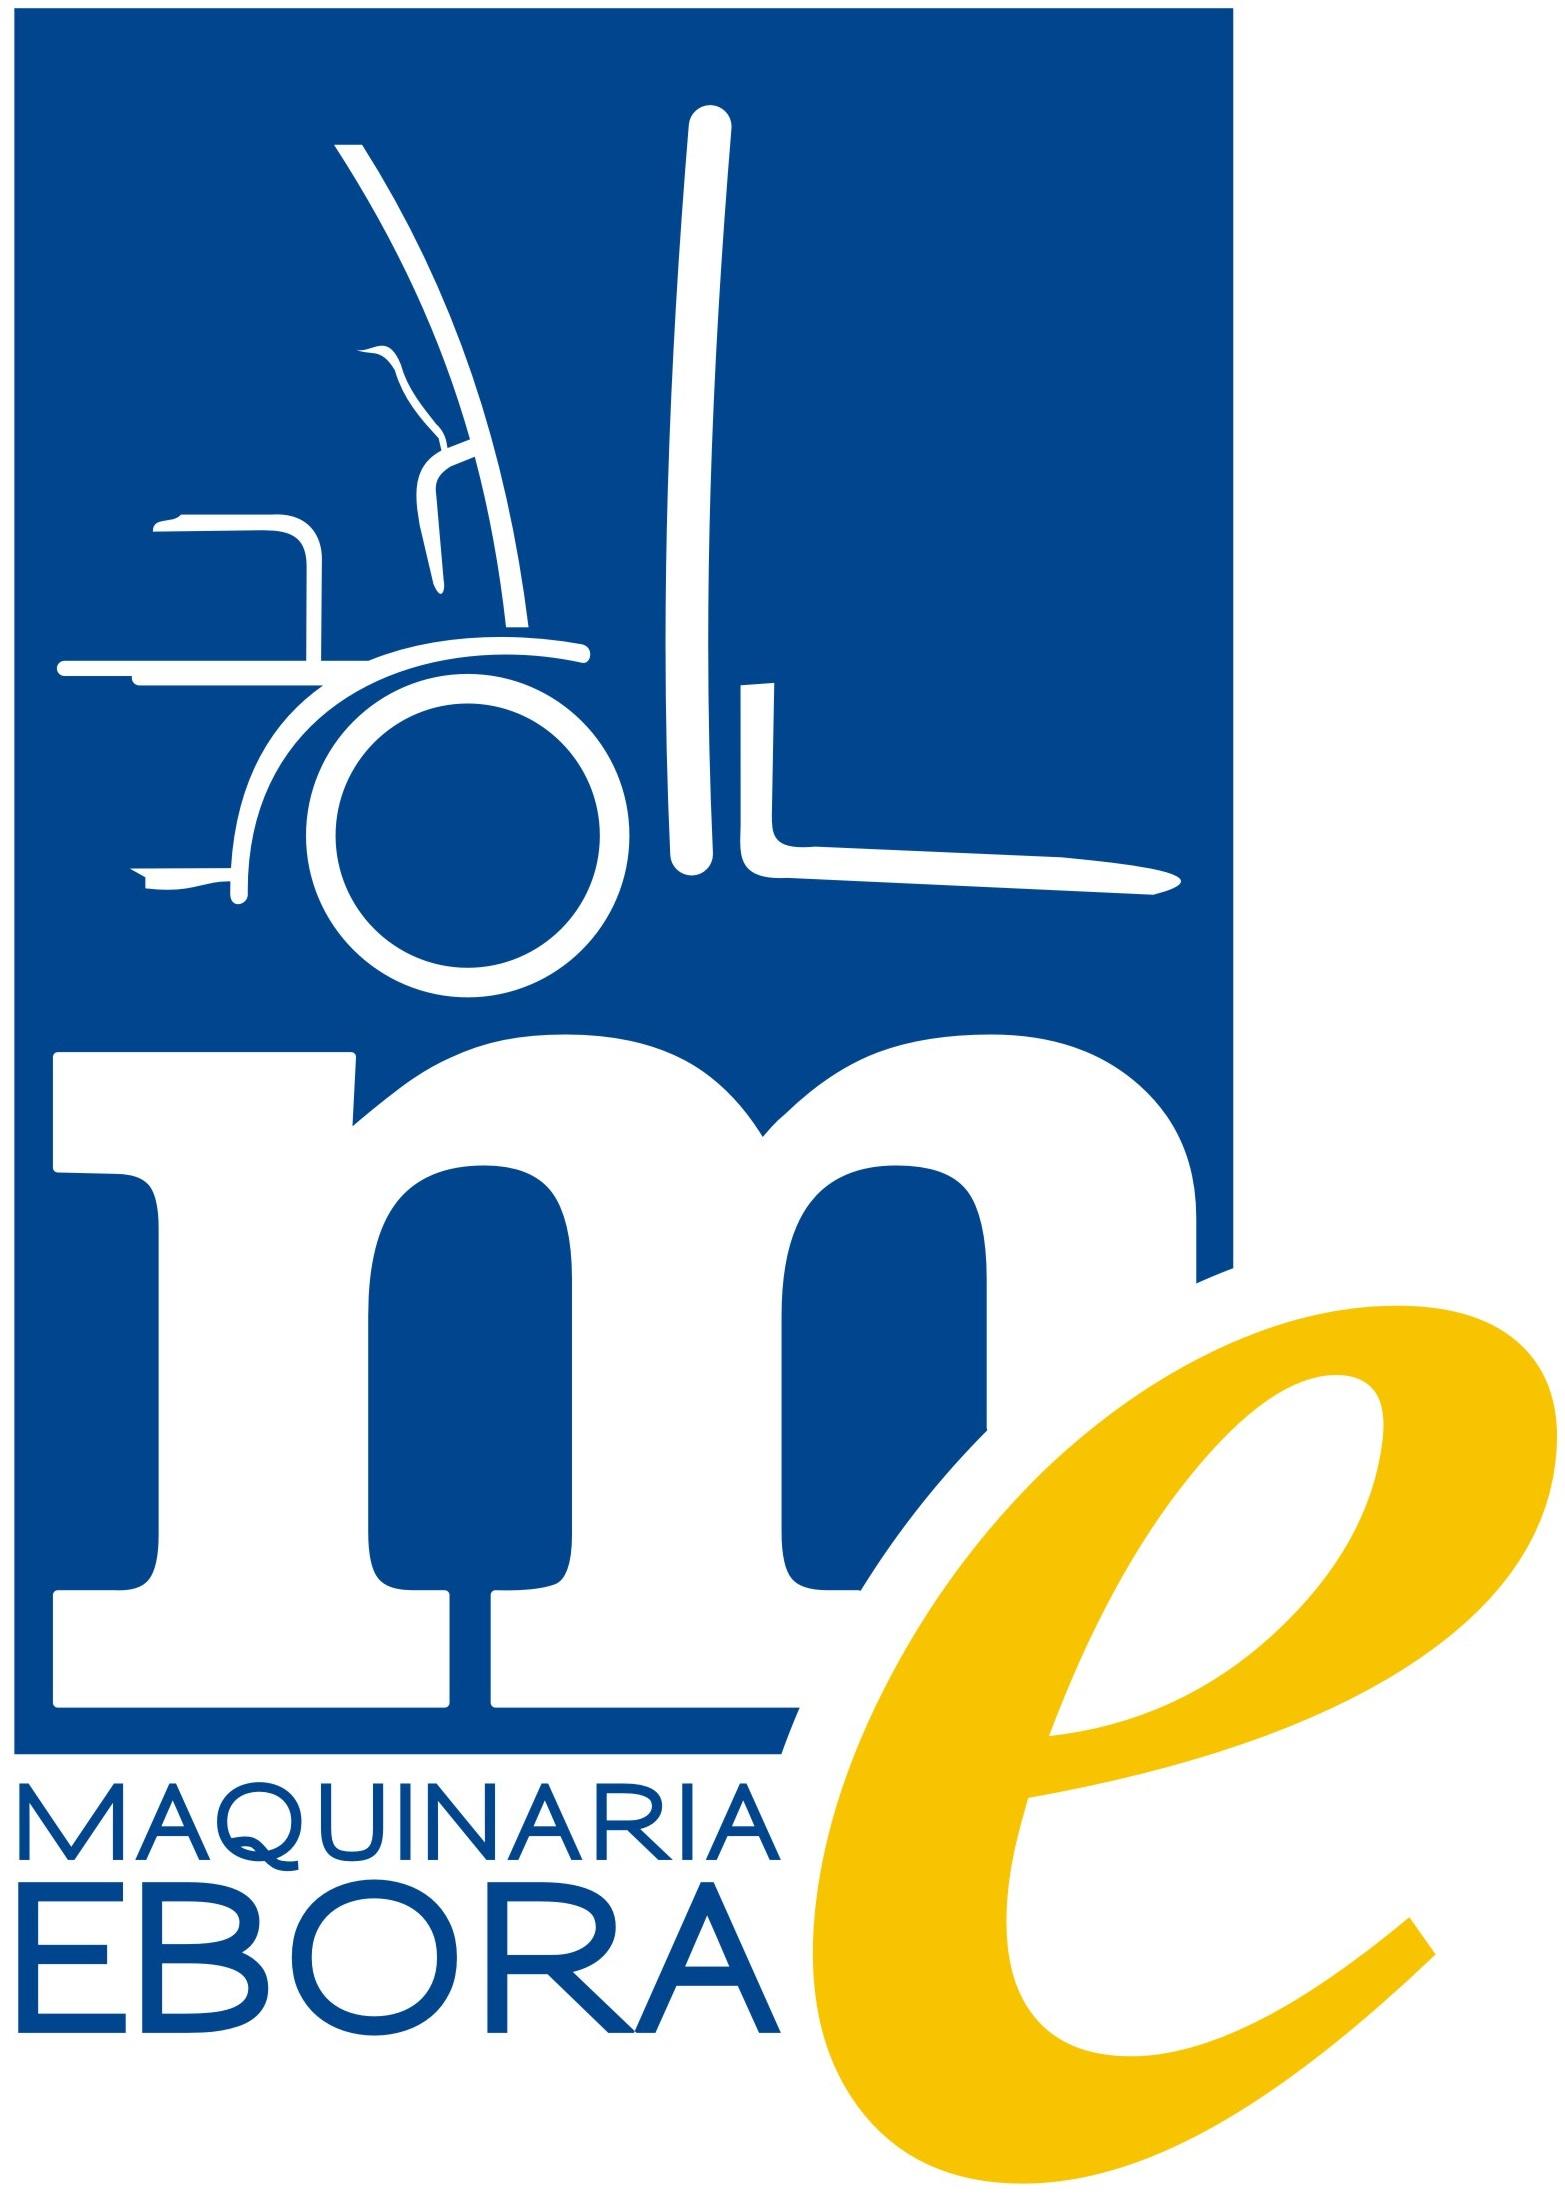 MAQUINARIA EBORA